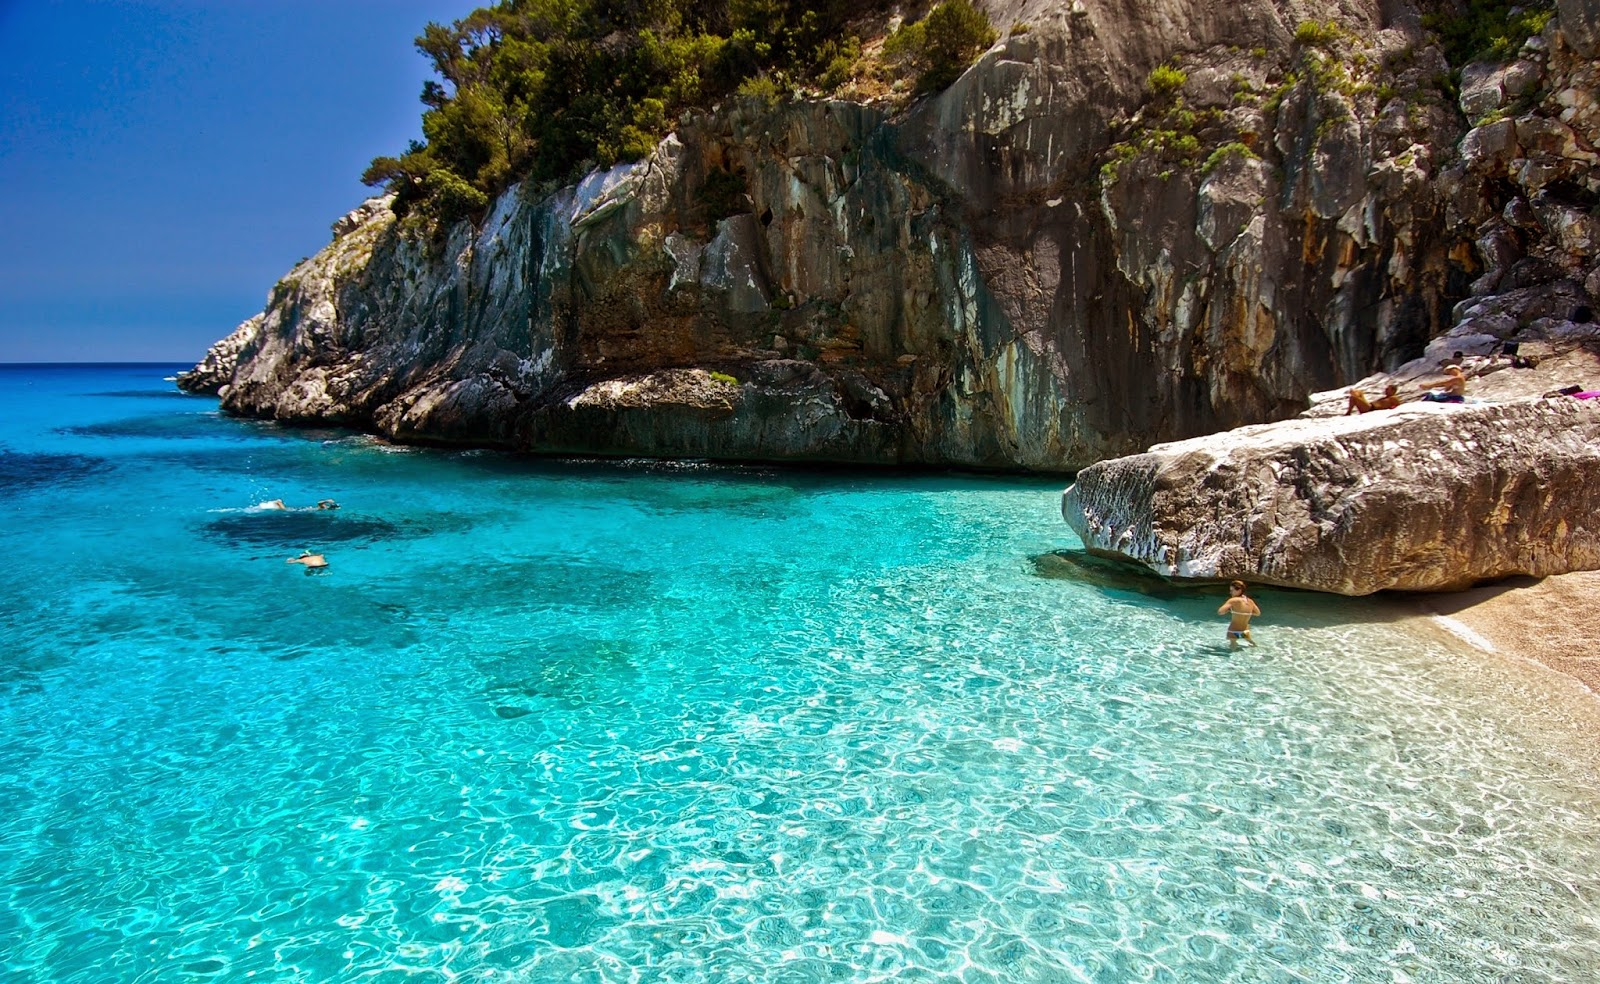 All Wallpapers Island Beach Best HD 2014